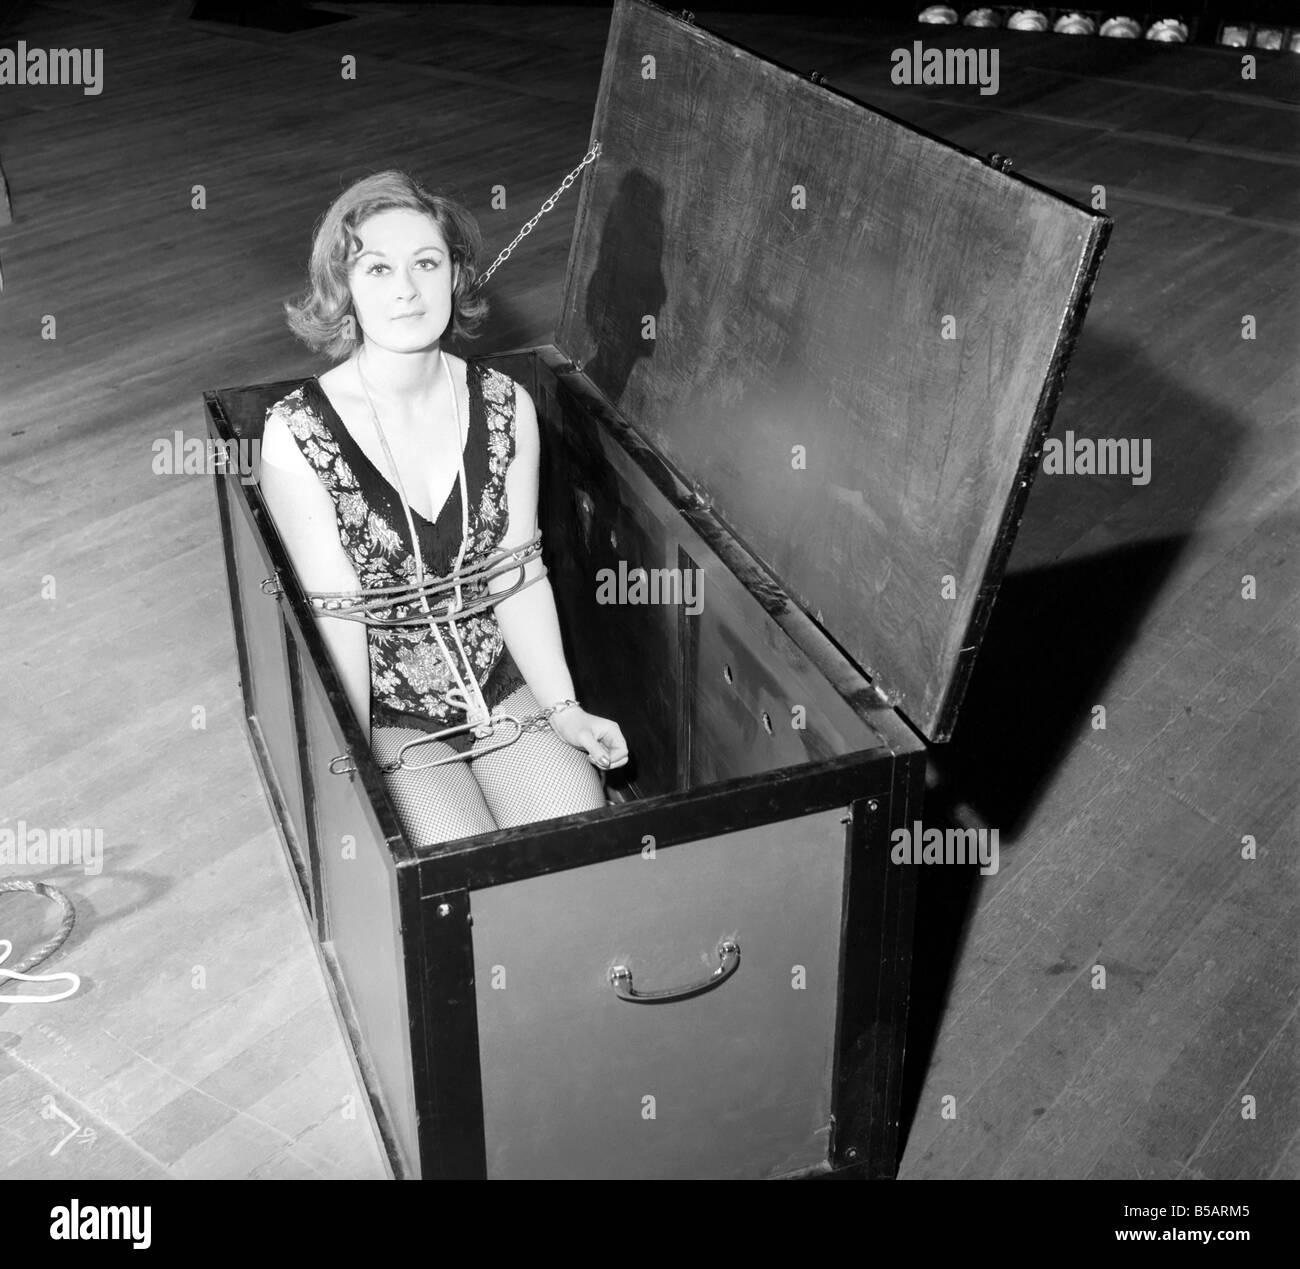 Woman escapologist Jill Fletcher. 1965 A1140 Stock Photo